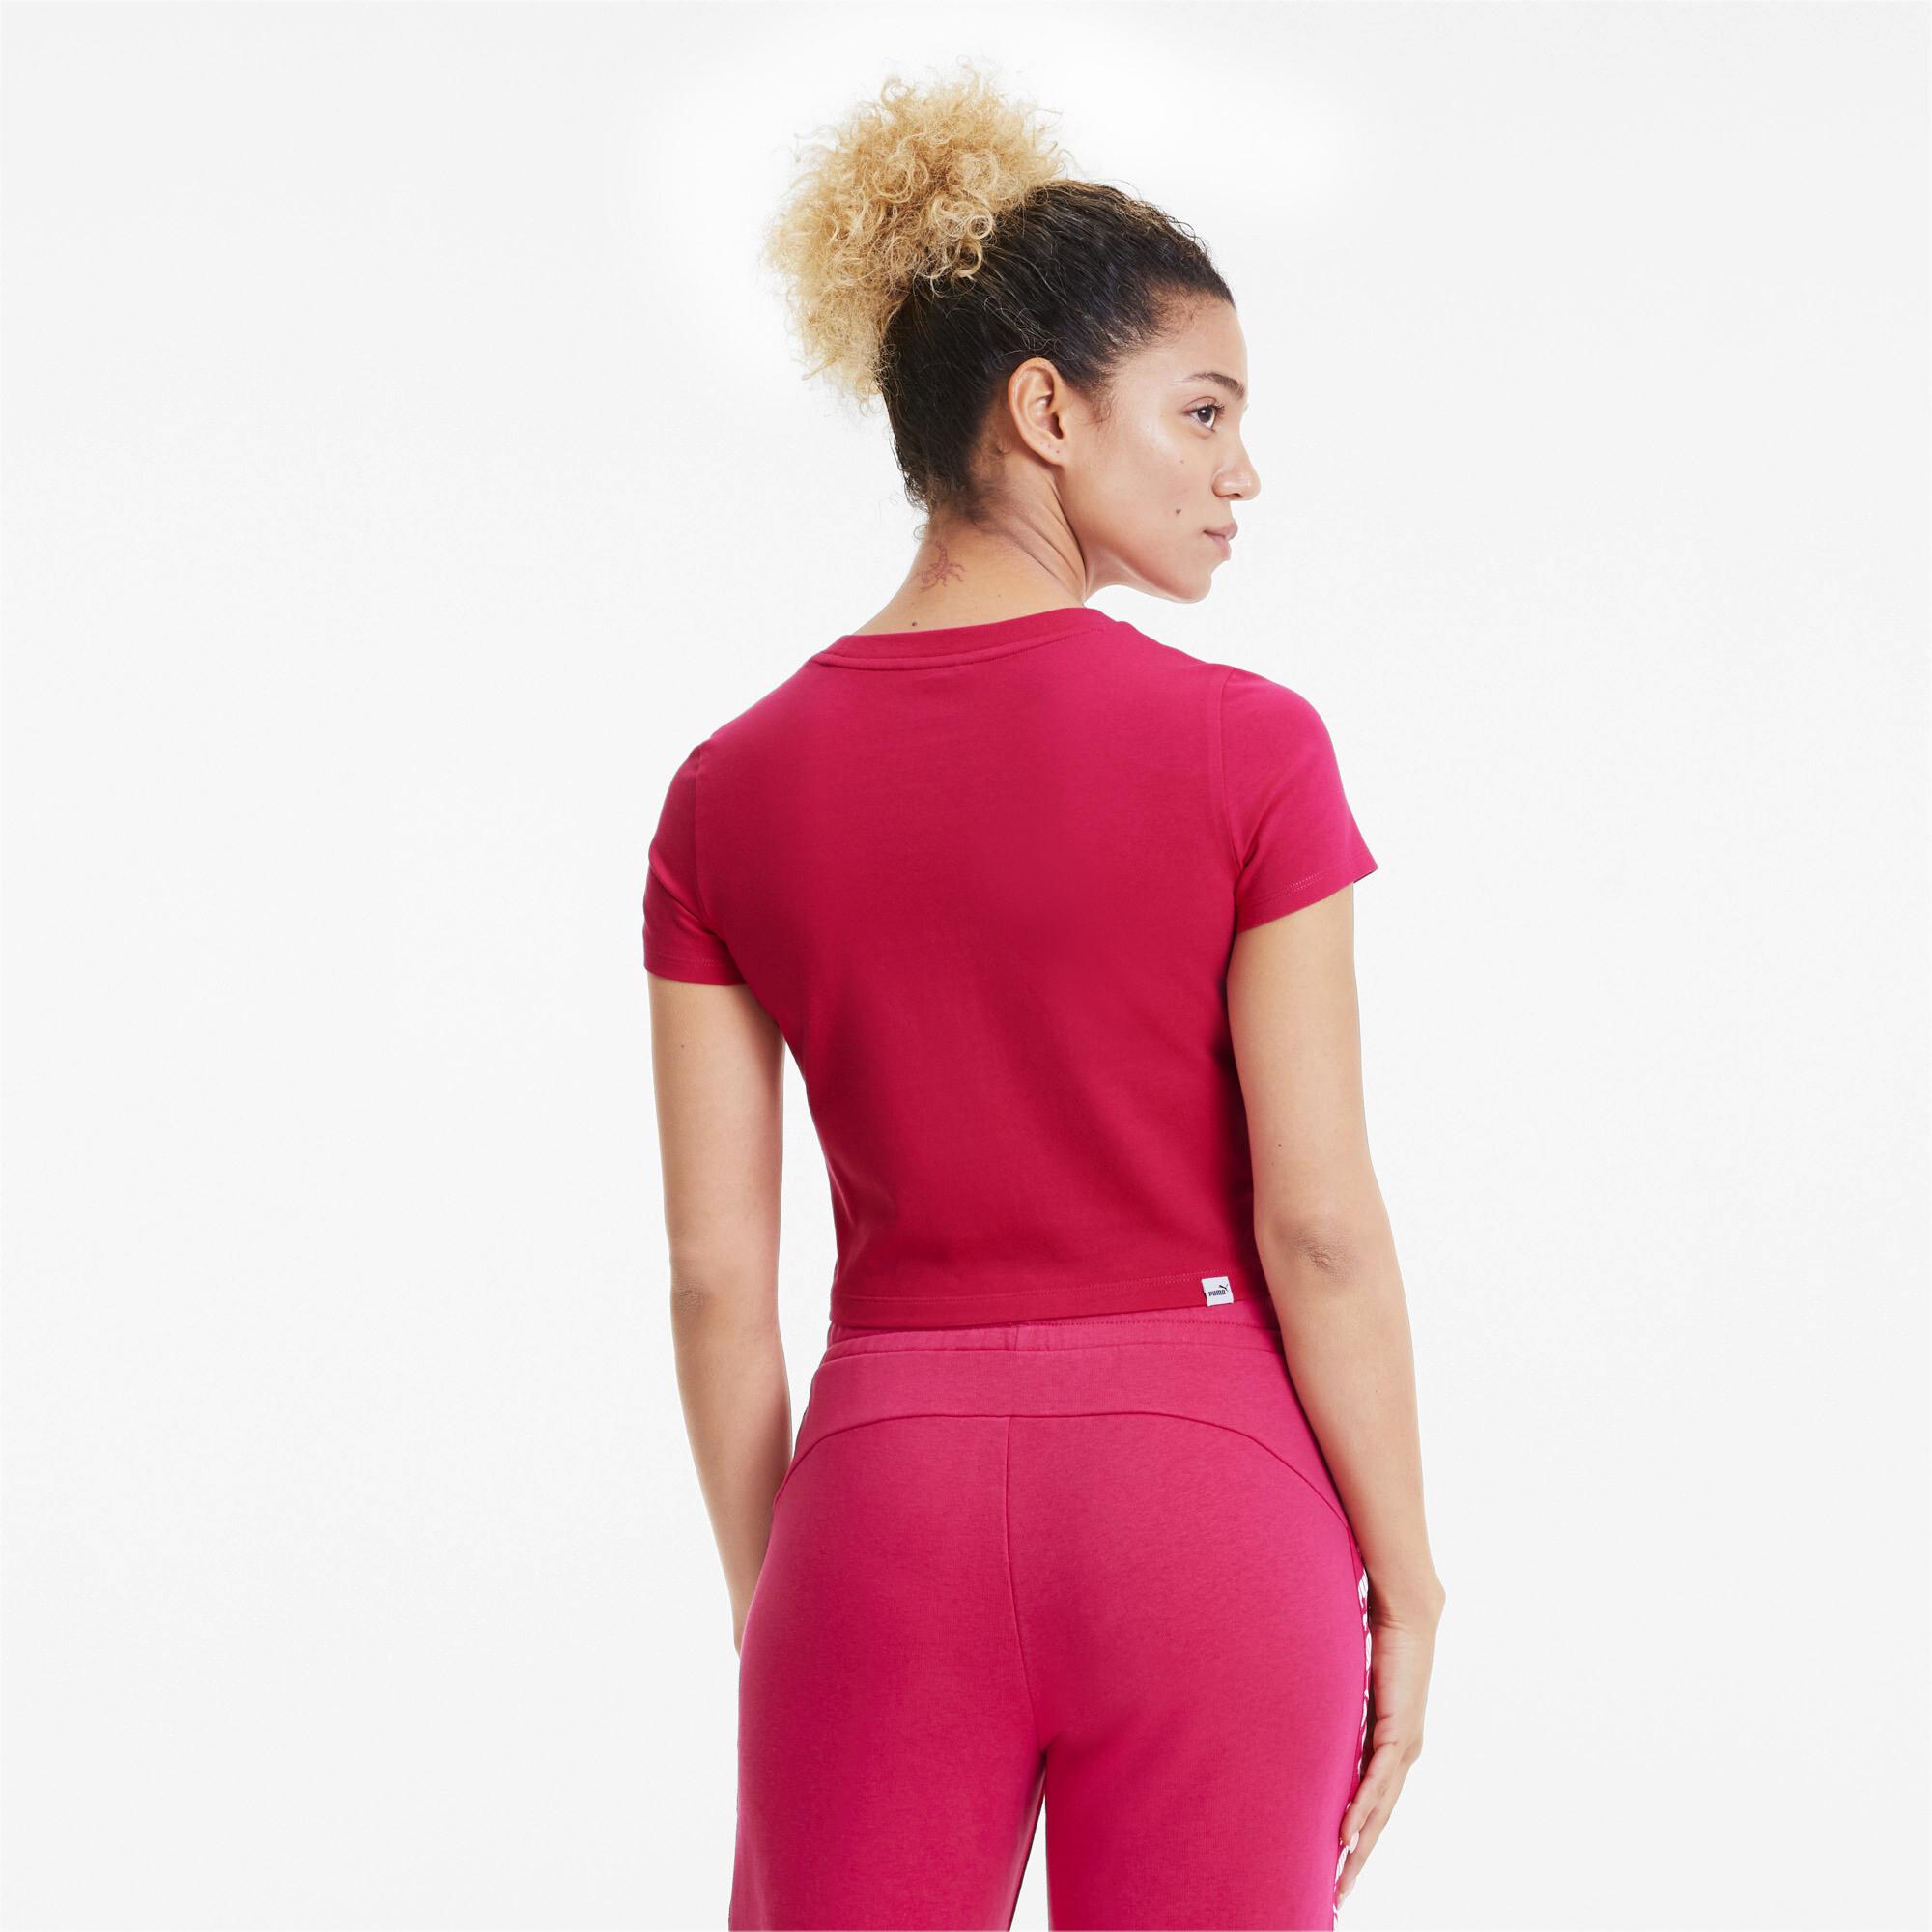 PUMA-Essentials-Women-039-s-Fitted-Tee-Women-Tee-Basics thumbnail 13